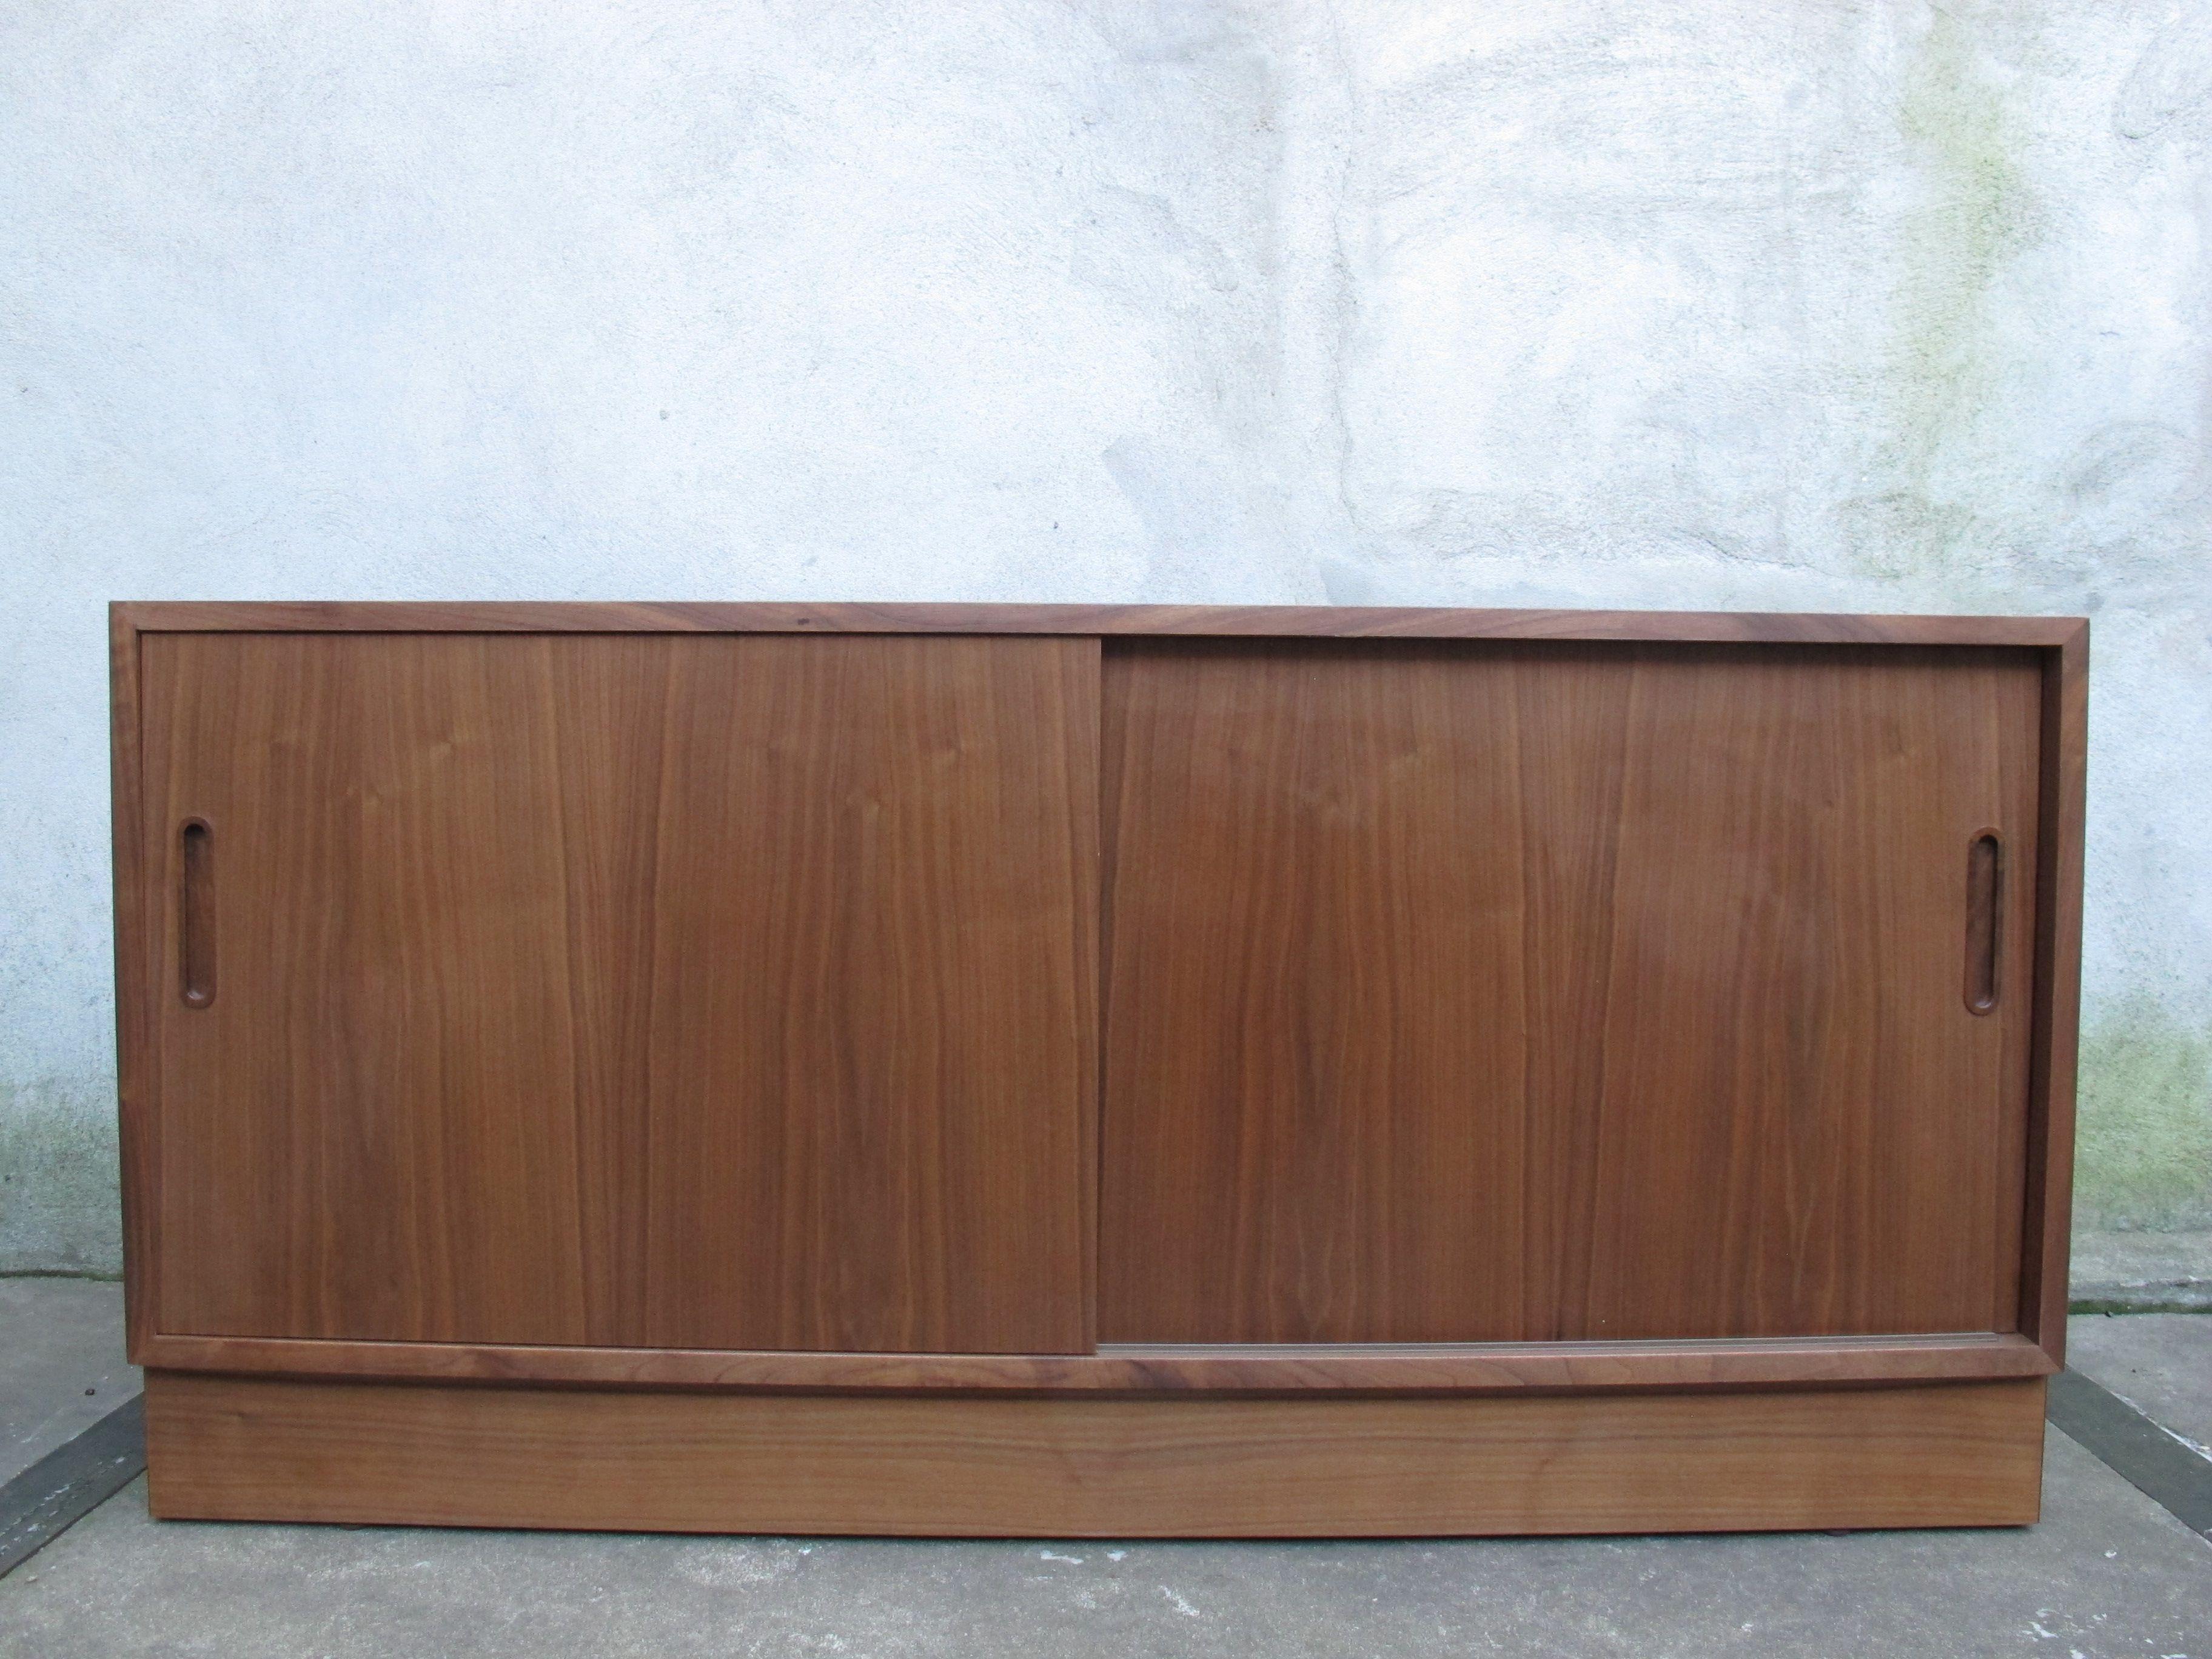 Danish Modern Teak Sideboard Cabinet By Poul Hundevad